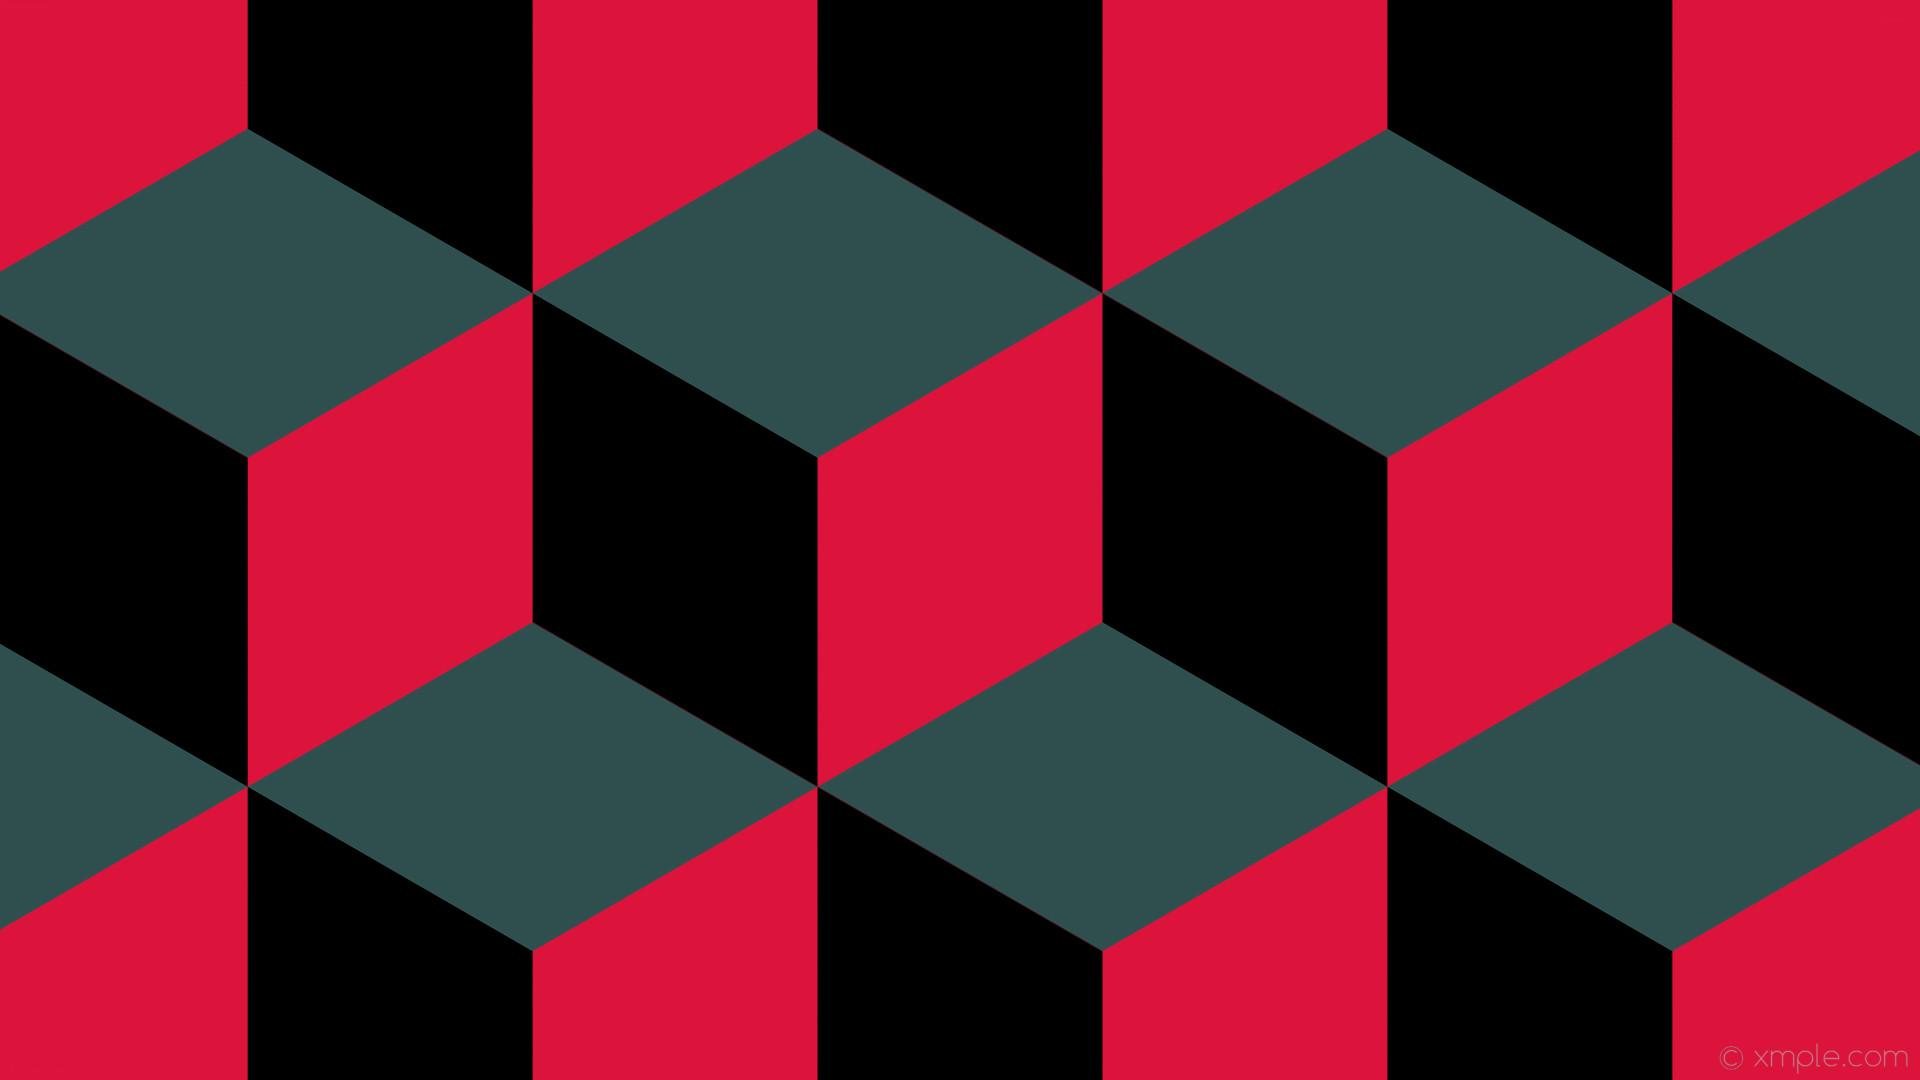 wallpaper 3d cubes grey red black crimson dark slate gray #dc143c #2f4f4f  #000000